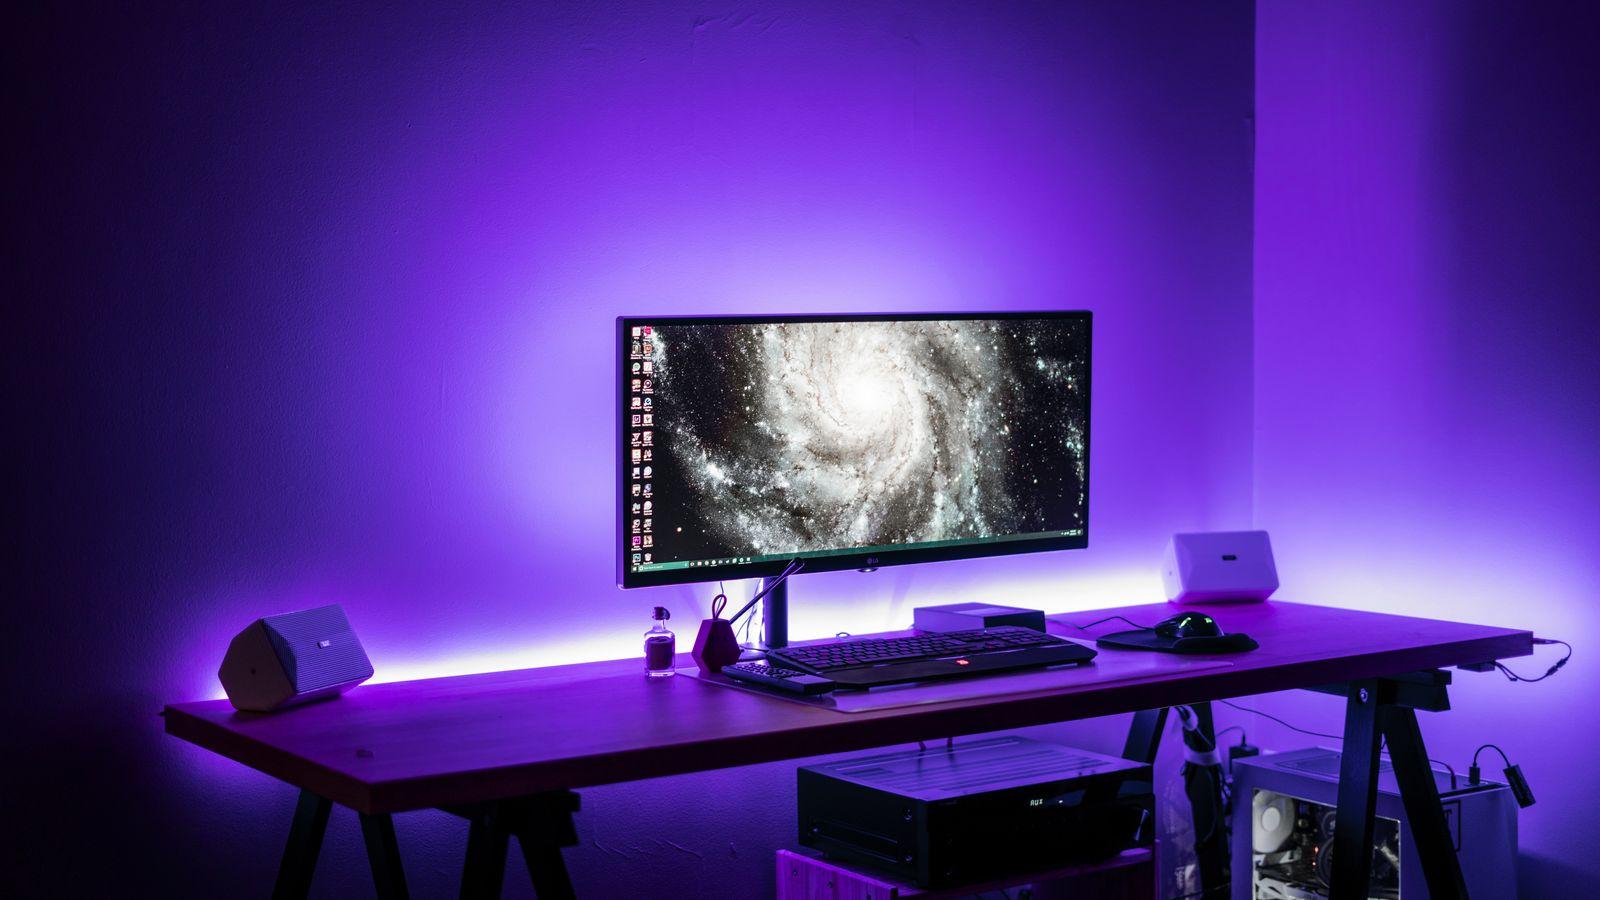 gaming desk purple light